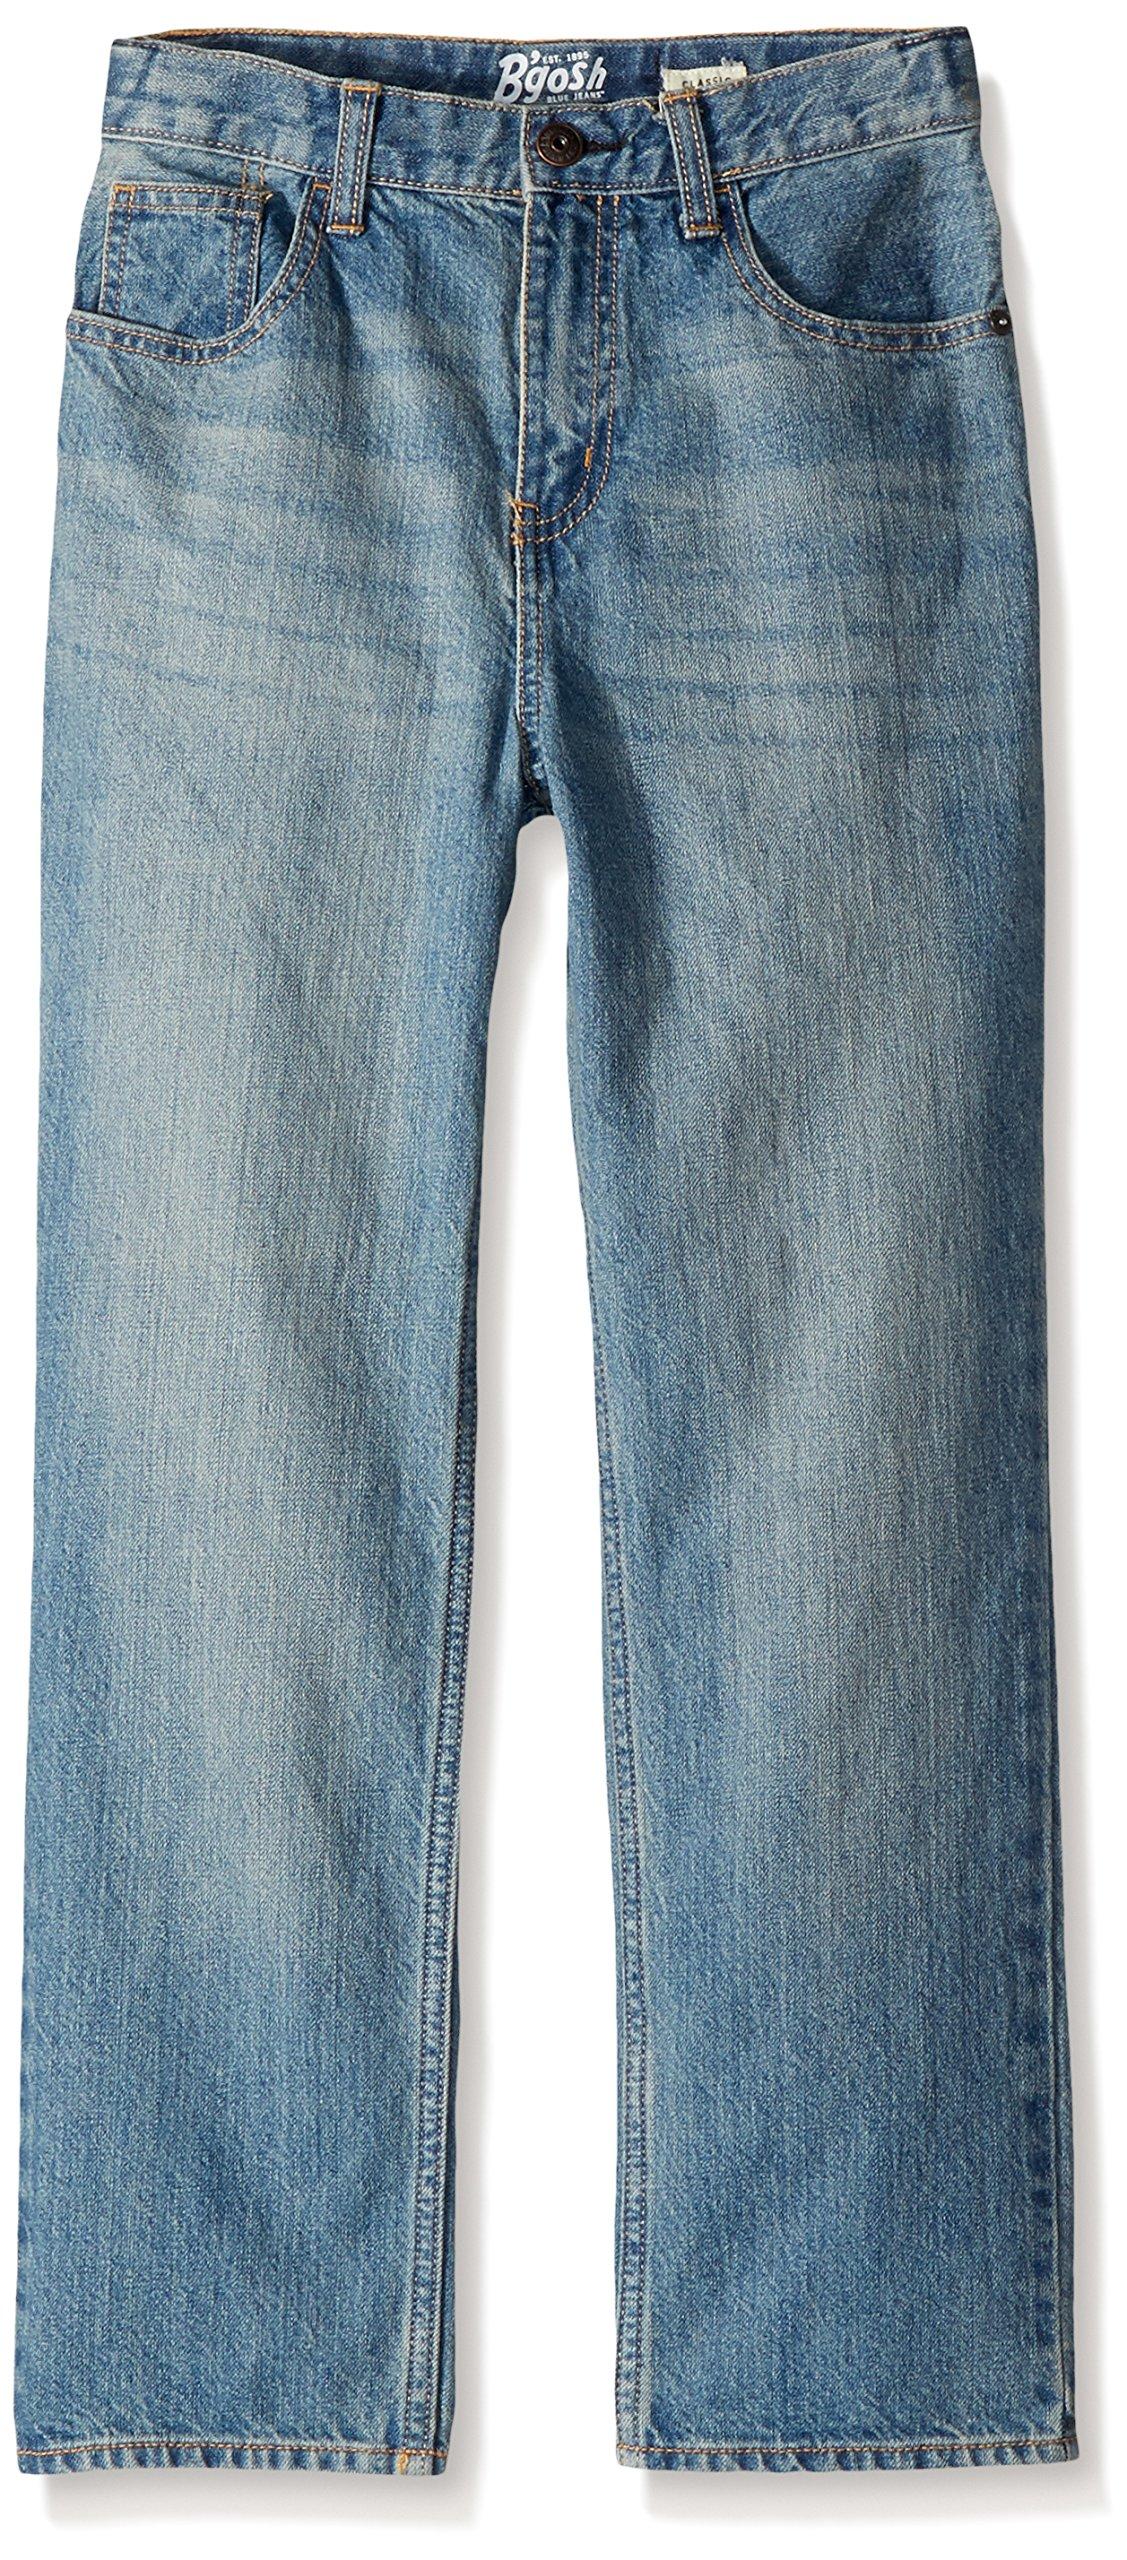 Osh Kosh Boys' Kids Classic Jeans, Natural Indigo, 8R